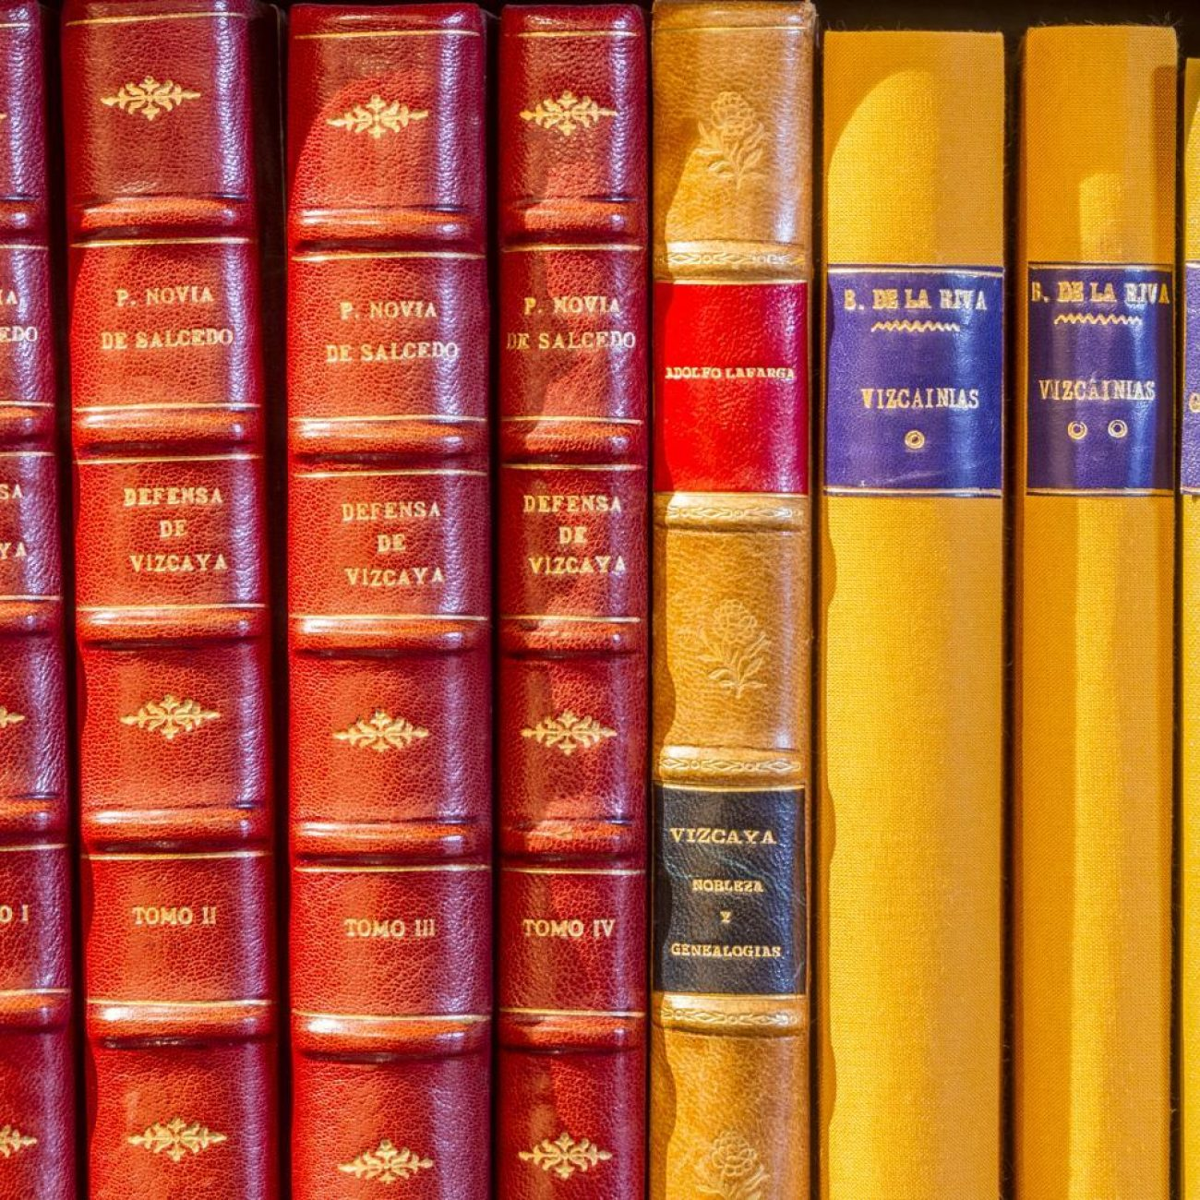 3548-libreria-anticuaria-astarloa-05